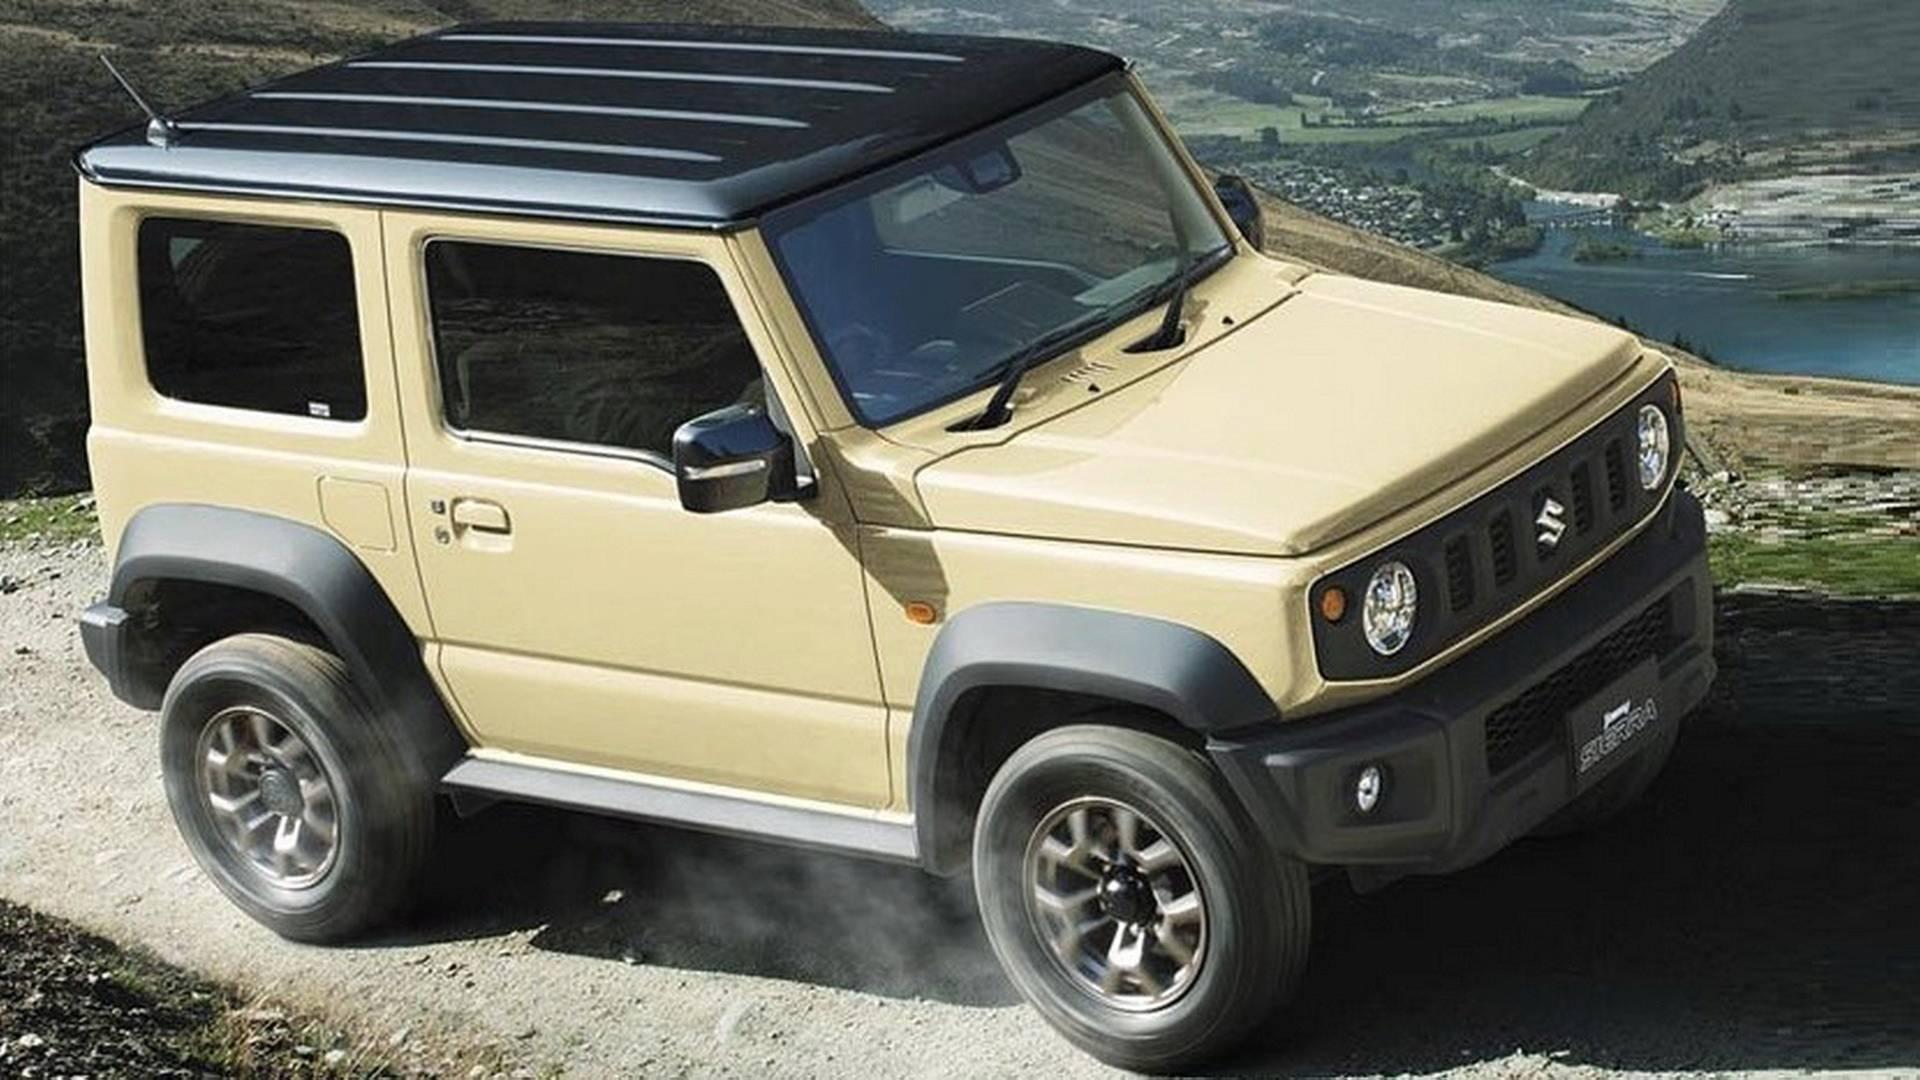 2019 Suzuki Jimny: News, Design, Release >> Suzuki Jimny See The Changes Side By Side